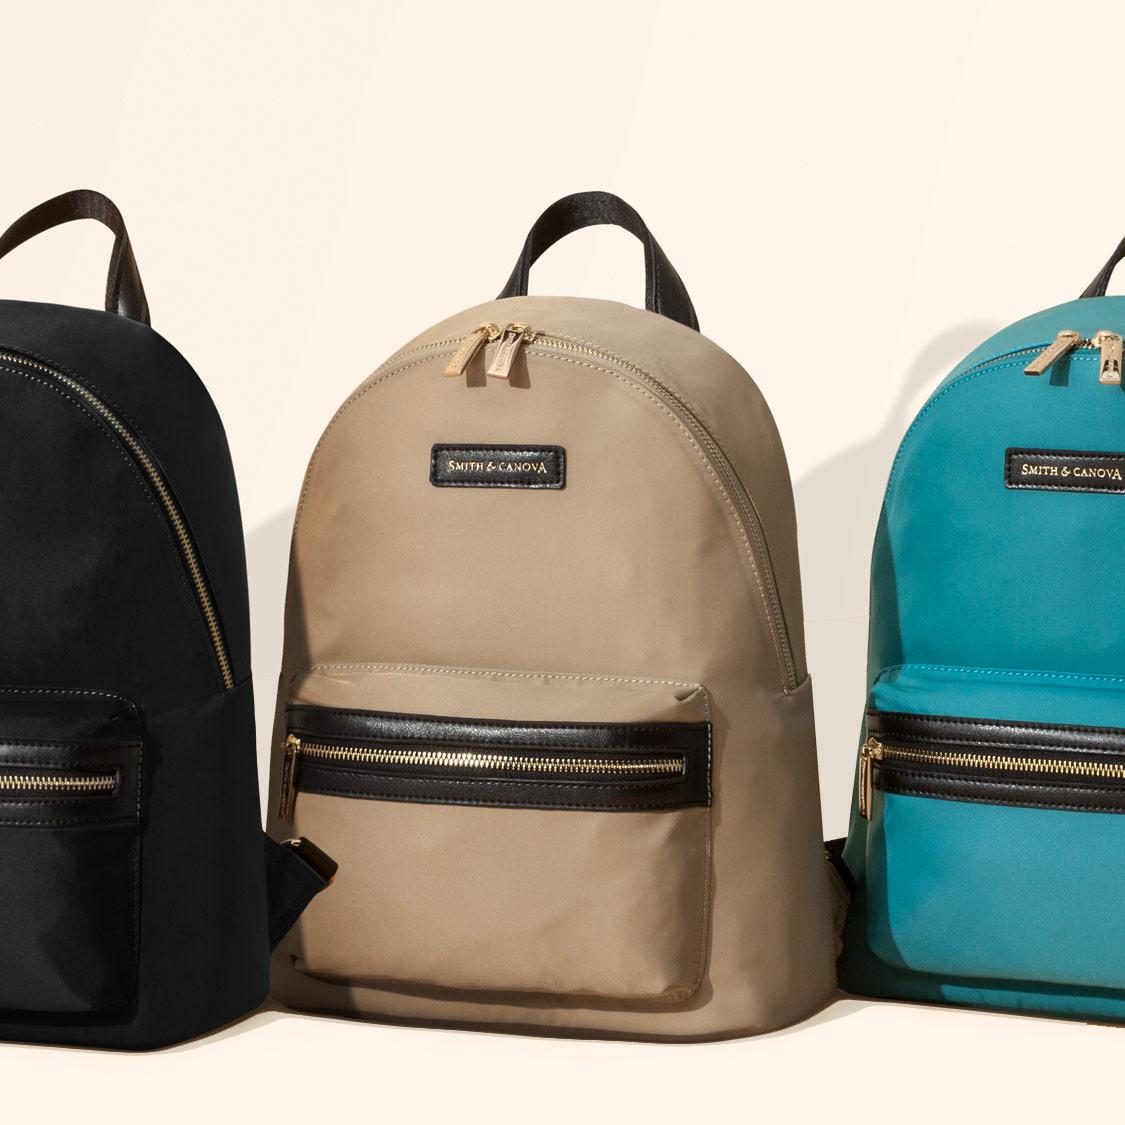 Smith & Canova - Backpacks